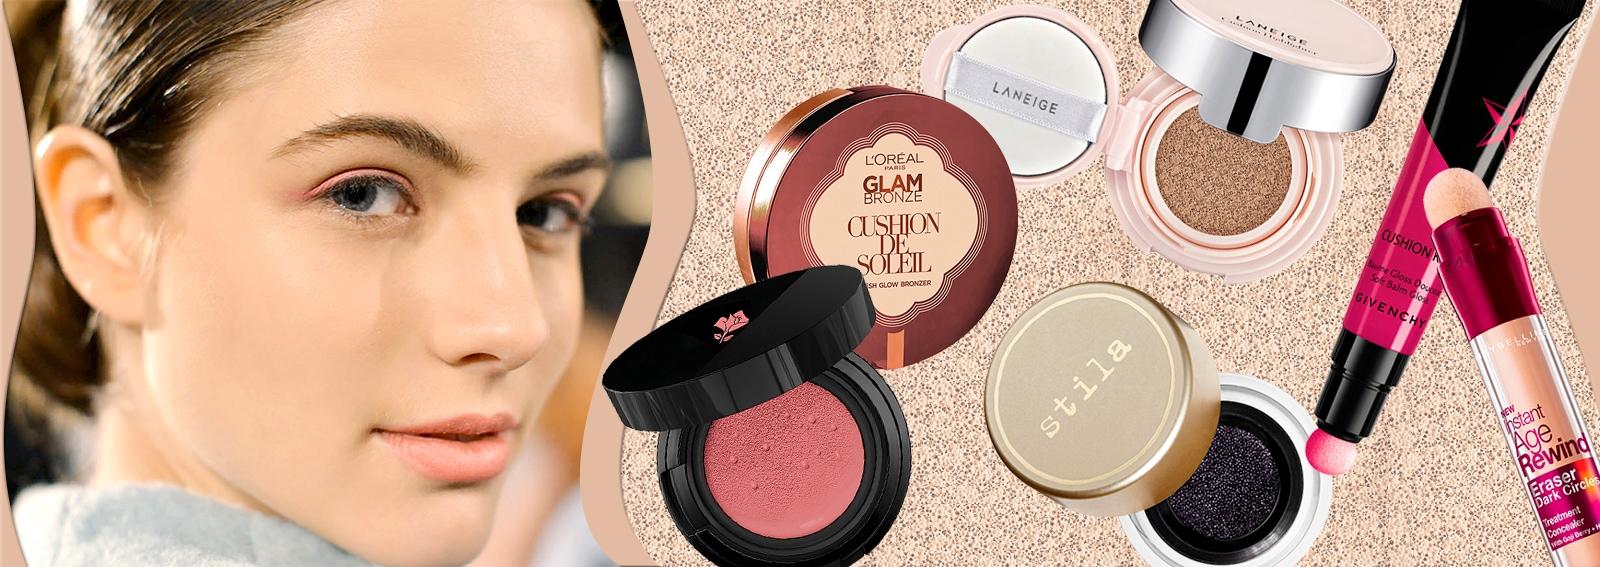 cover-cushion-make-up-fondotinta-blush-desktop